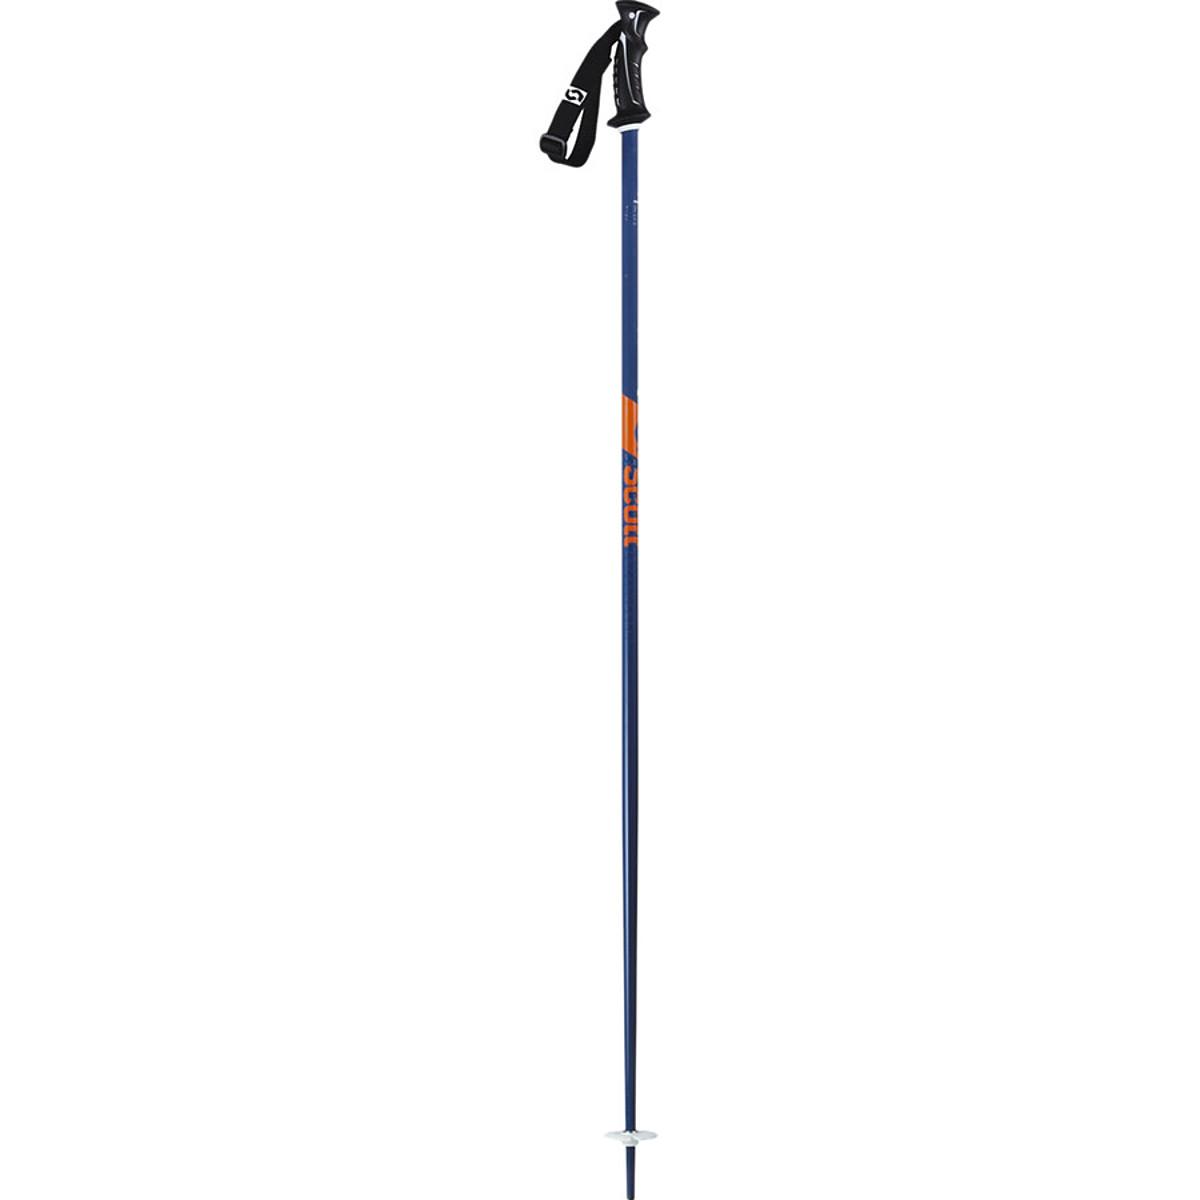 Scott 720 Poles